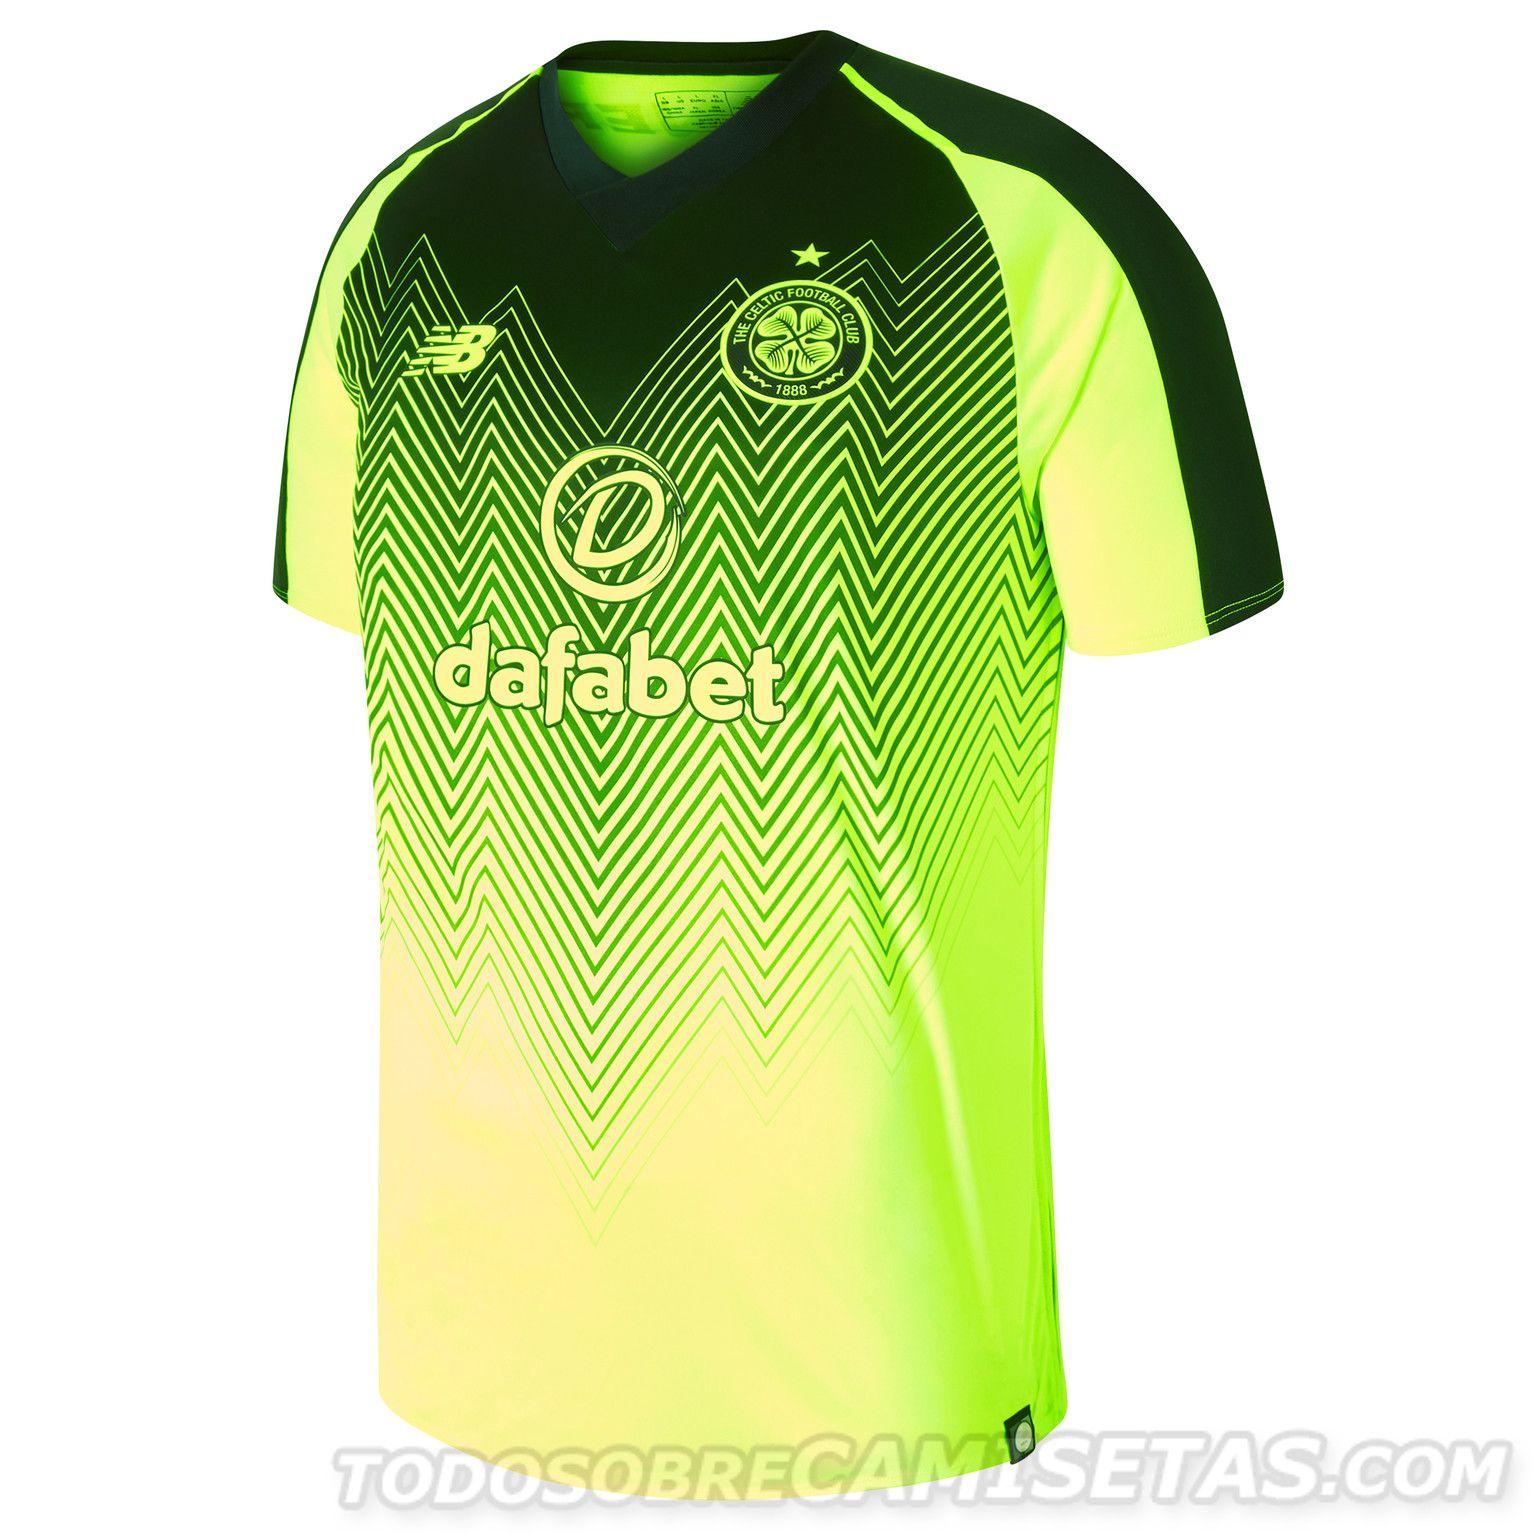 official photos 5a971 33f3b Celtic FC New Balance Third Kit 2018-19 | Sublimation ideas ...